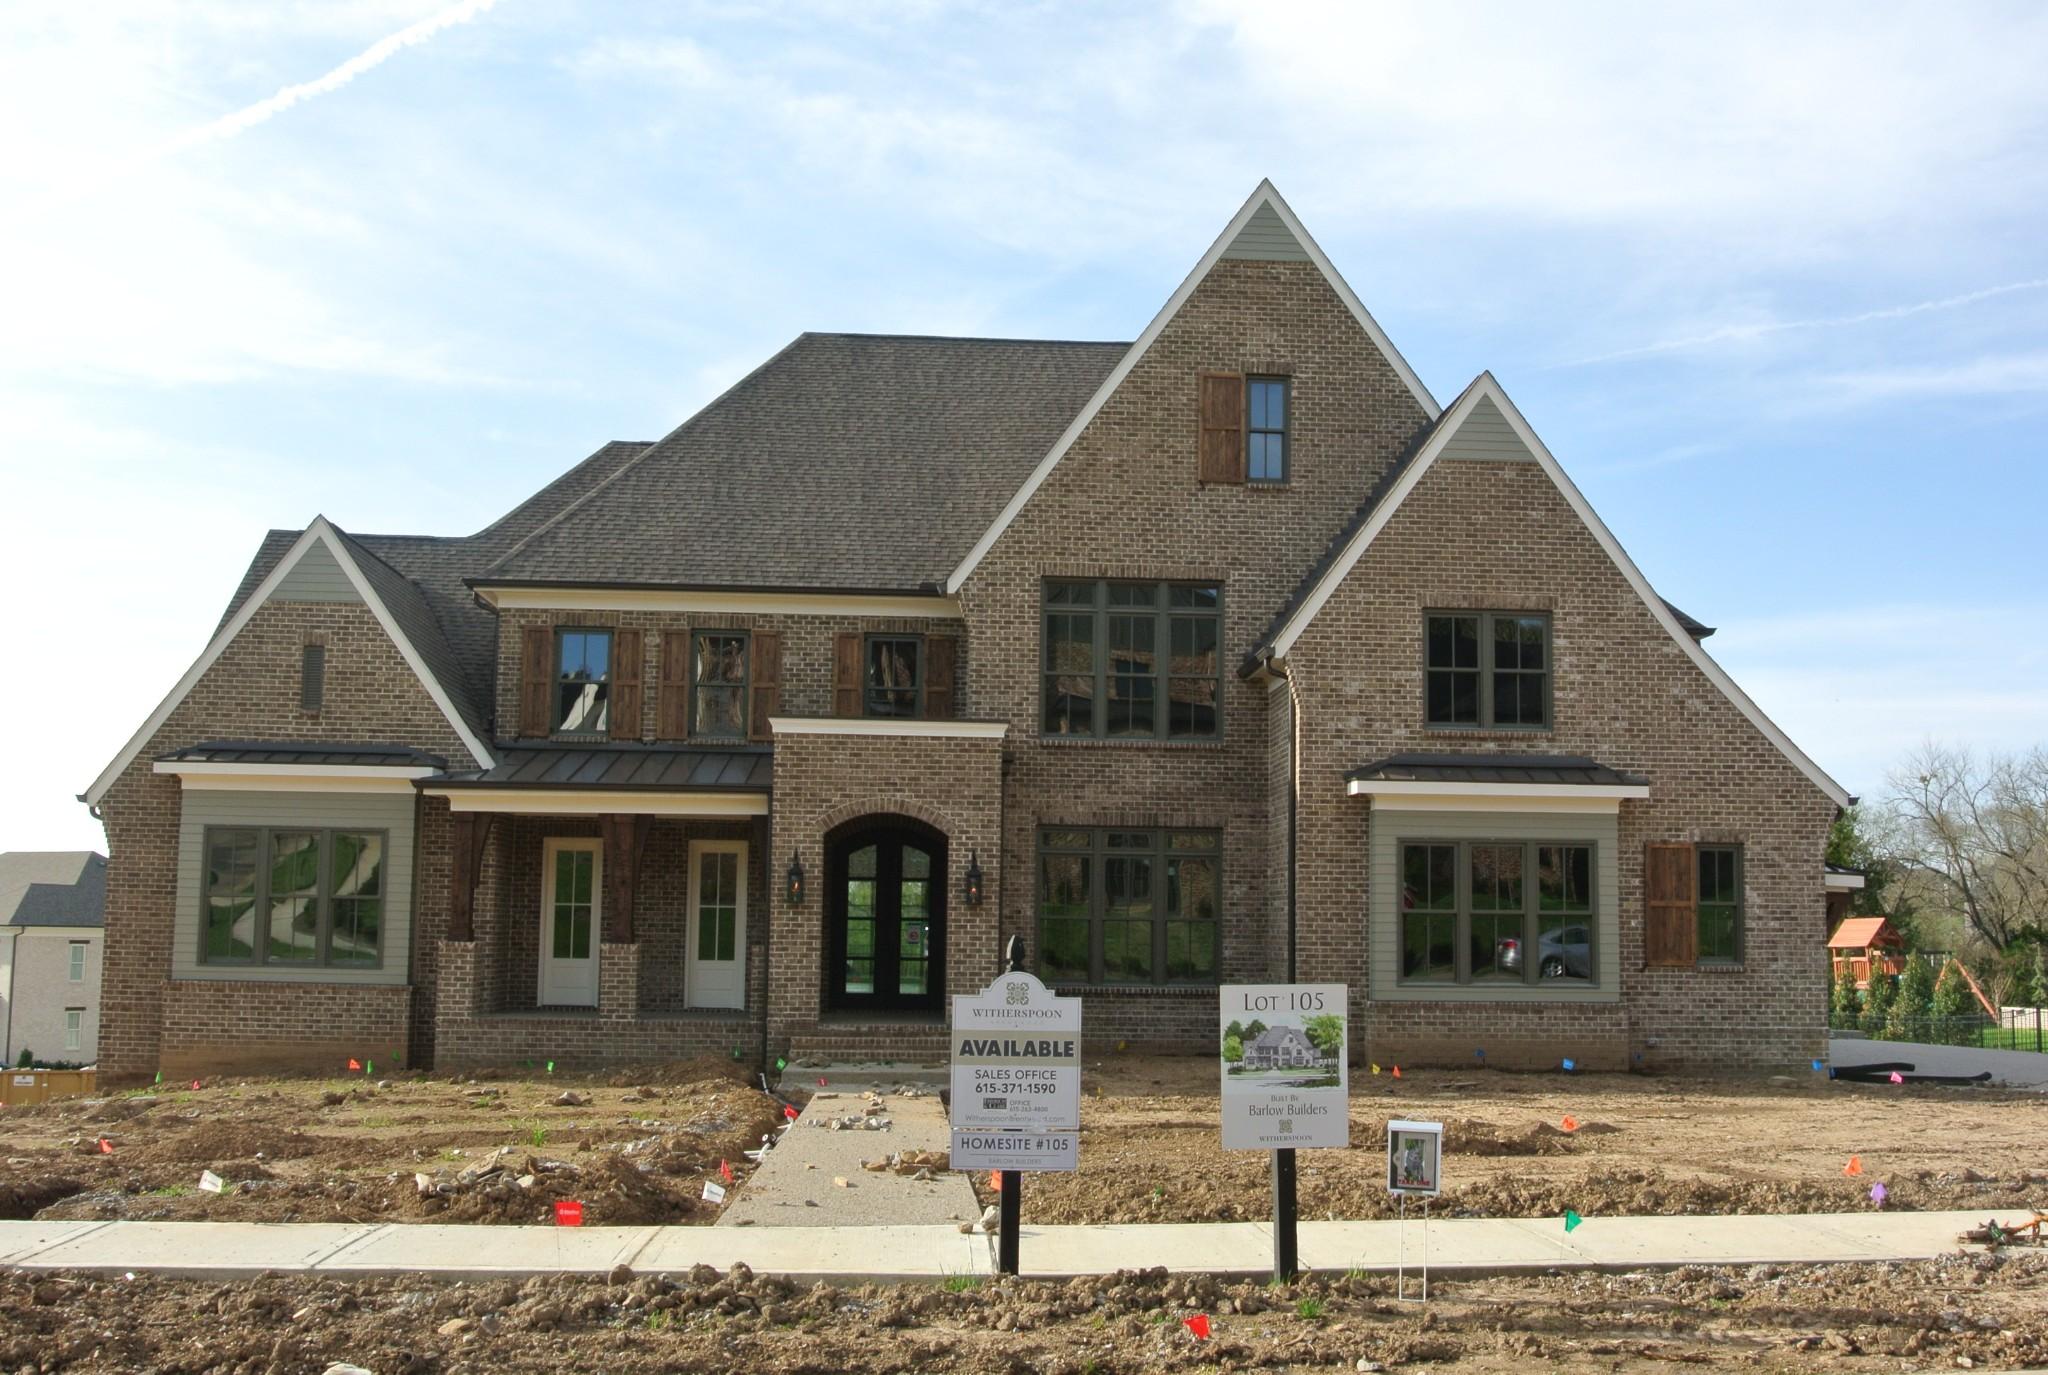 1523 Tellcroft Dr. (Lot #105), Brentwood, TN 37027 - Brentwood, TN real estate listing